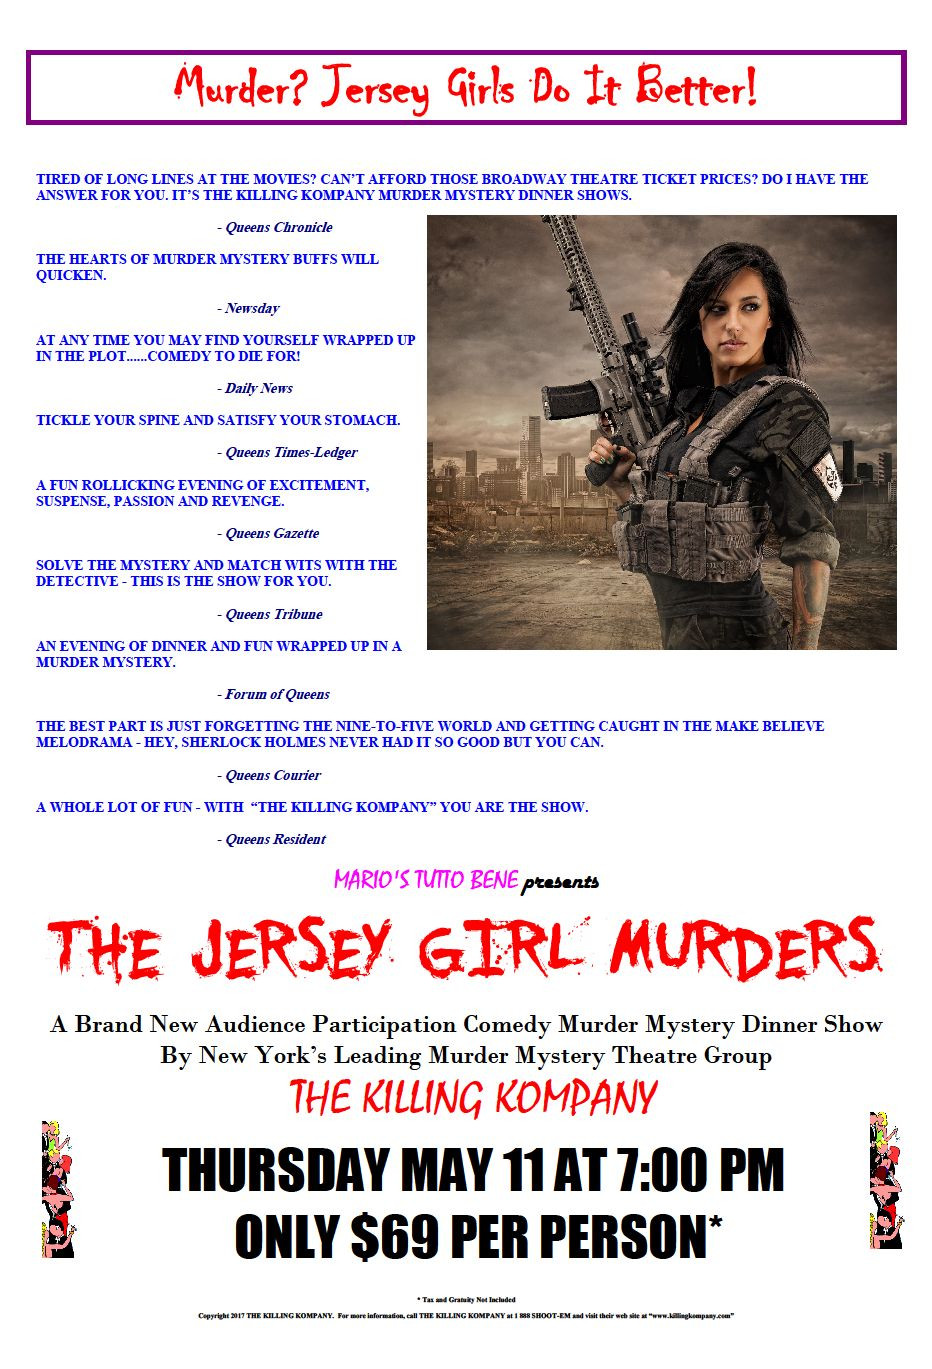 Murder Mystery Dinner Nj  Murder Mystery Dinner Theater Shows & Other Interactive